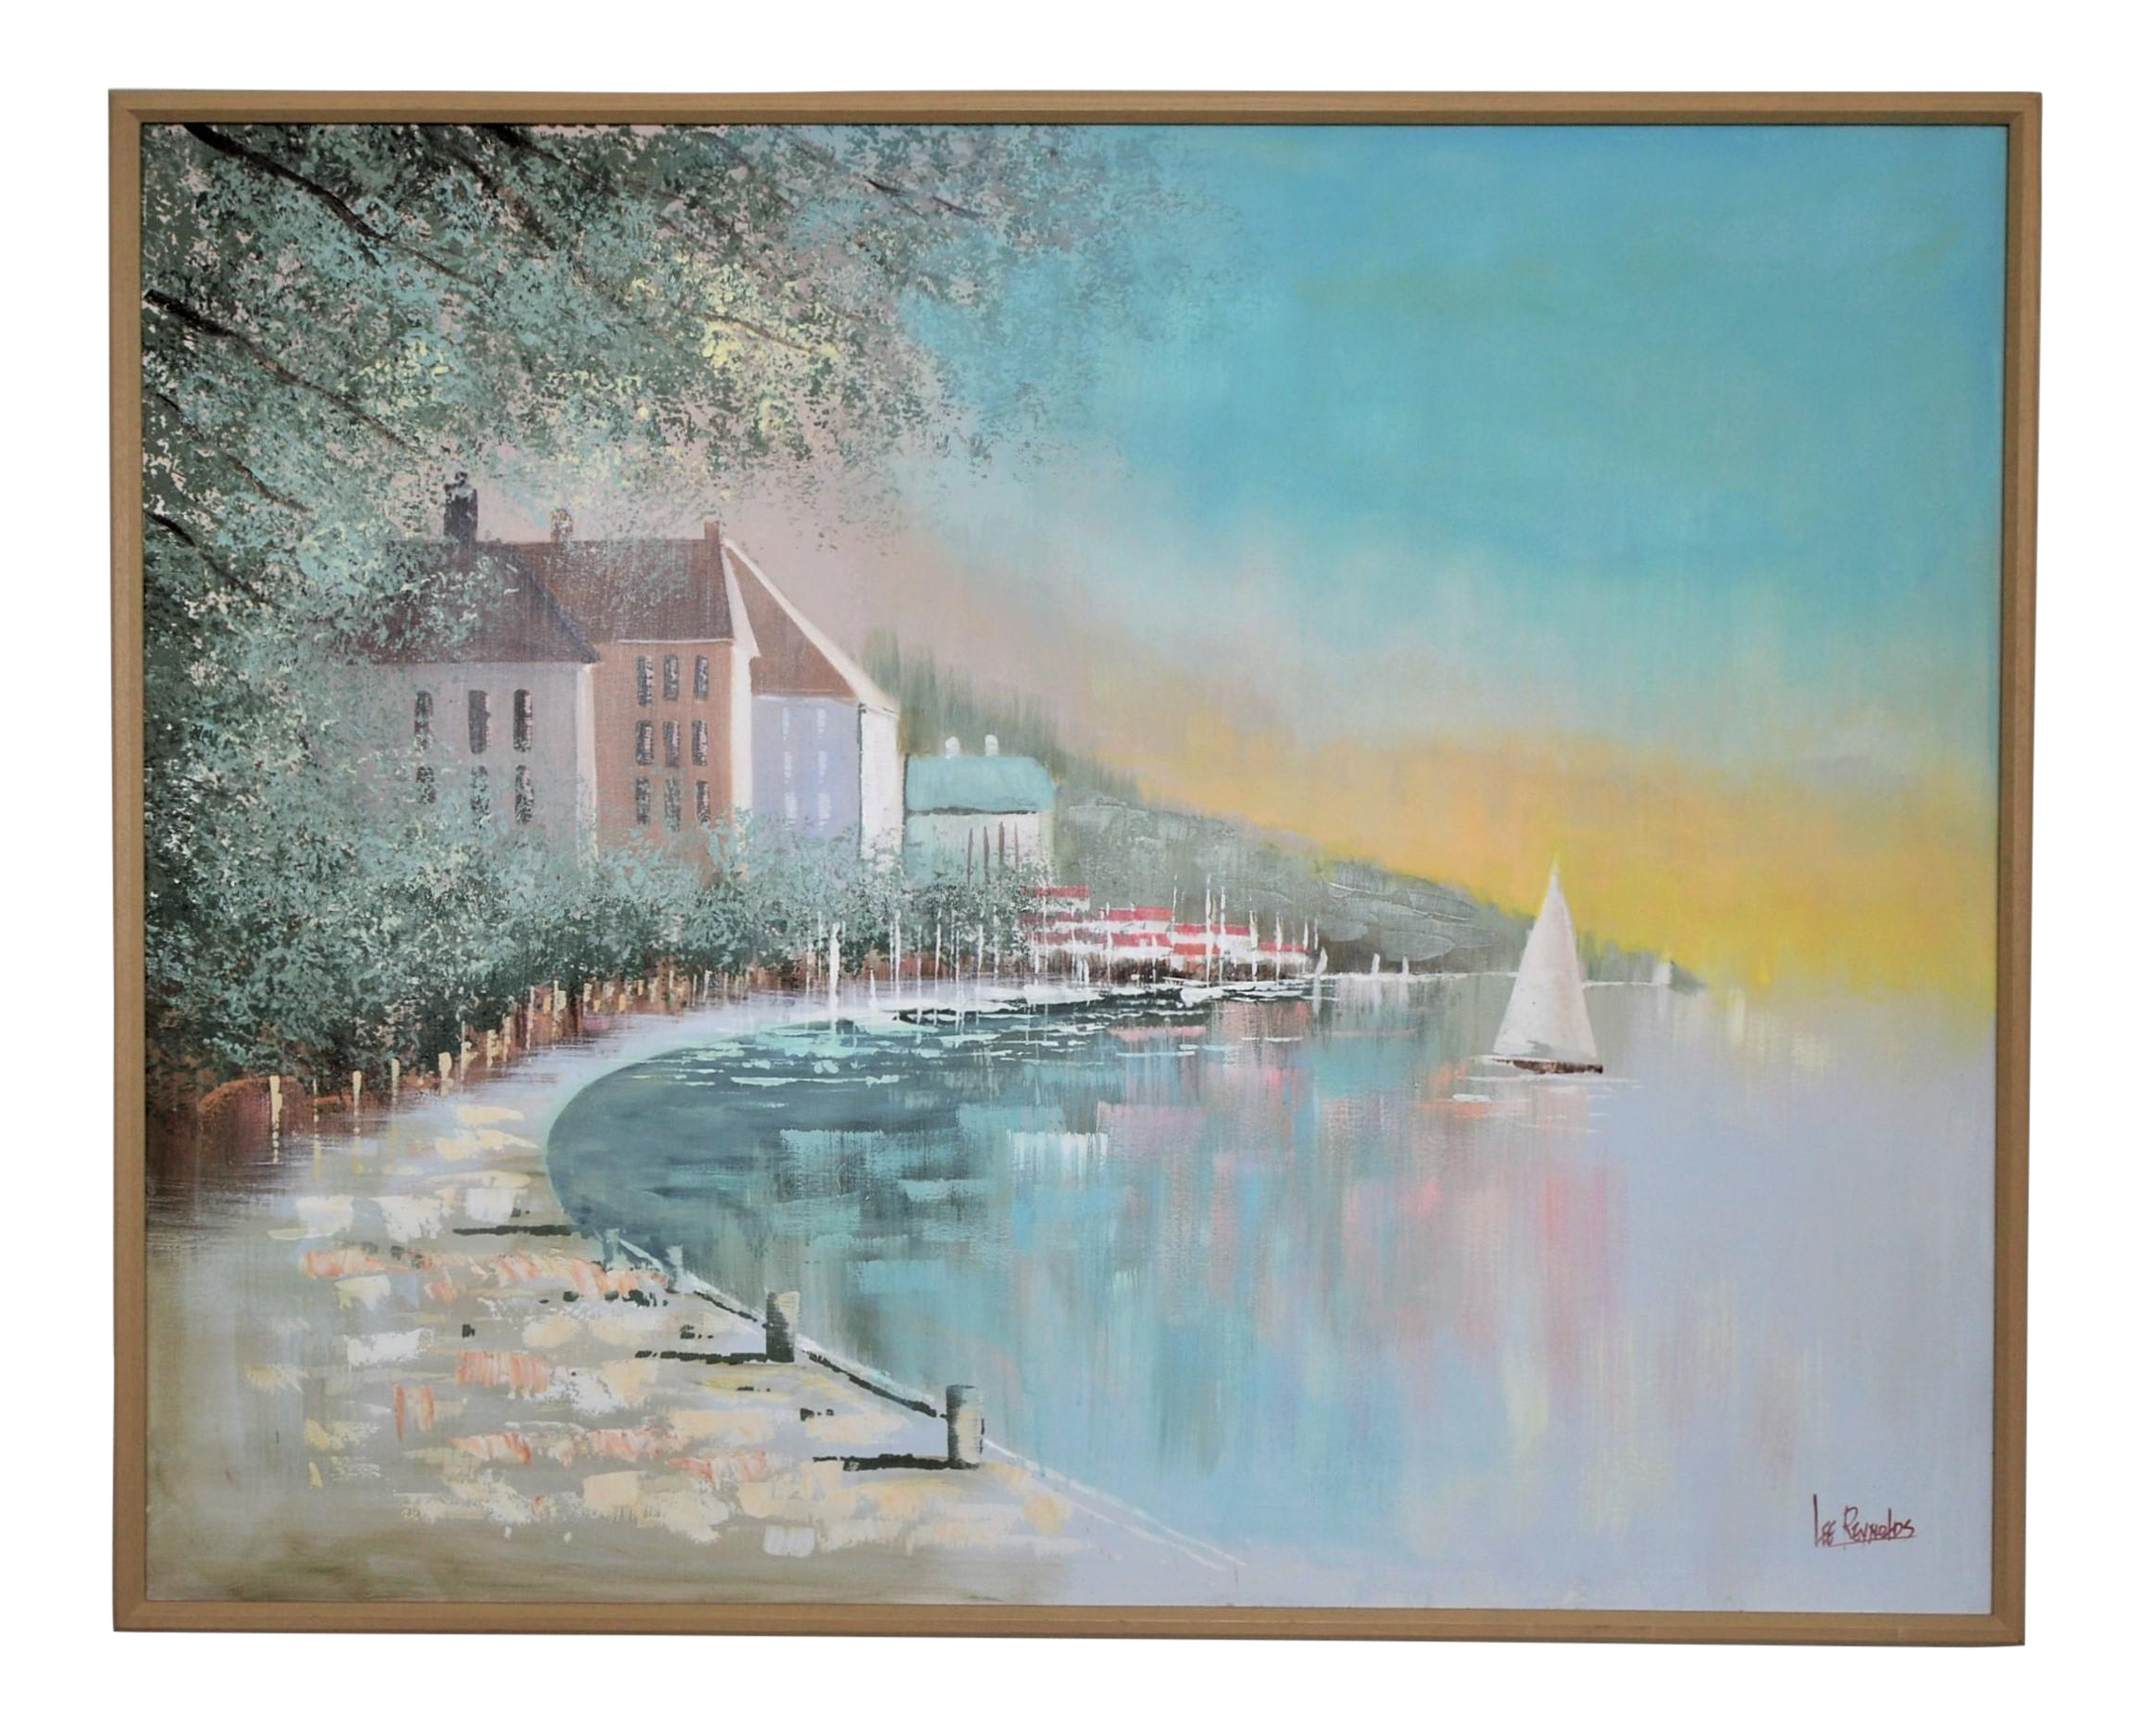 Lee Reynolds Original Seascape Maritime Oil Painting On